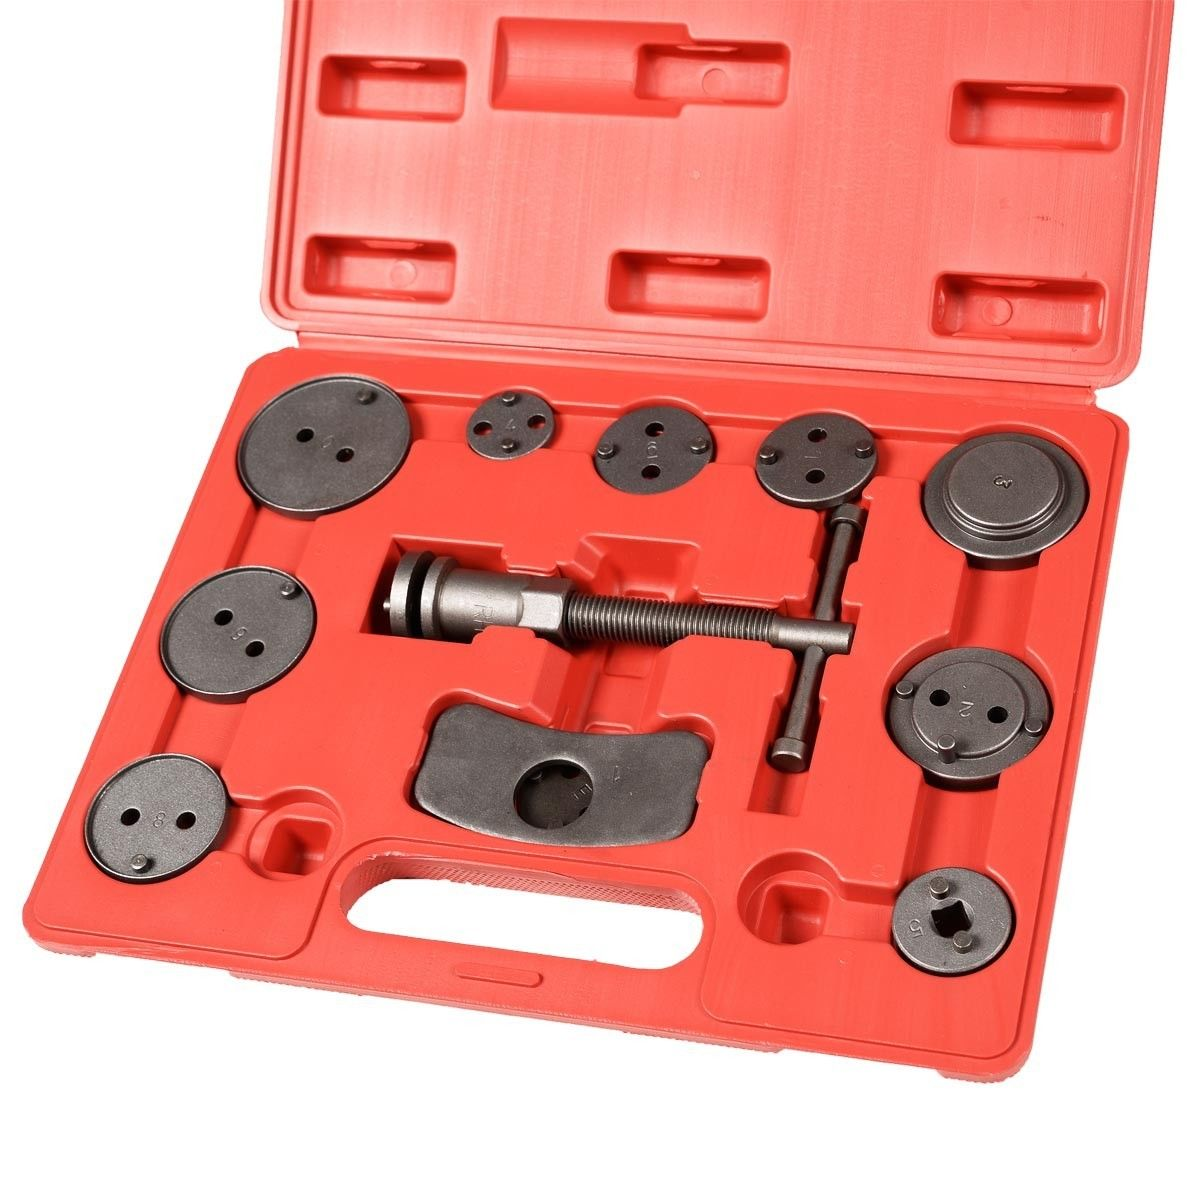 12 PC Universal Disc Brake Piston Caliper Rewind Back Tool Kit Automotive Tool